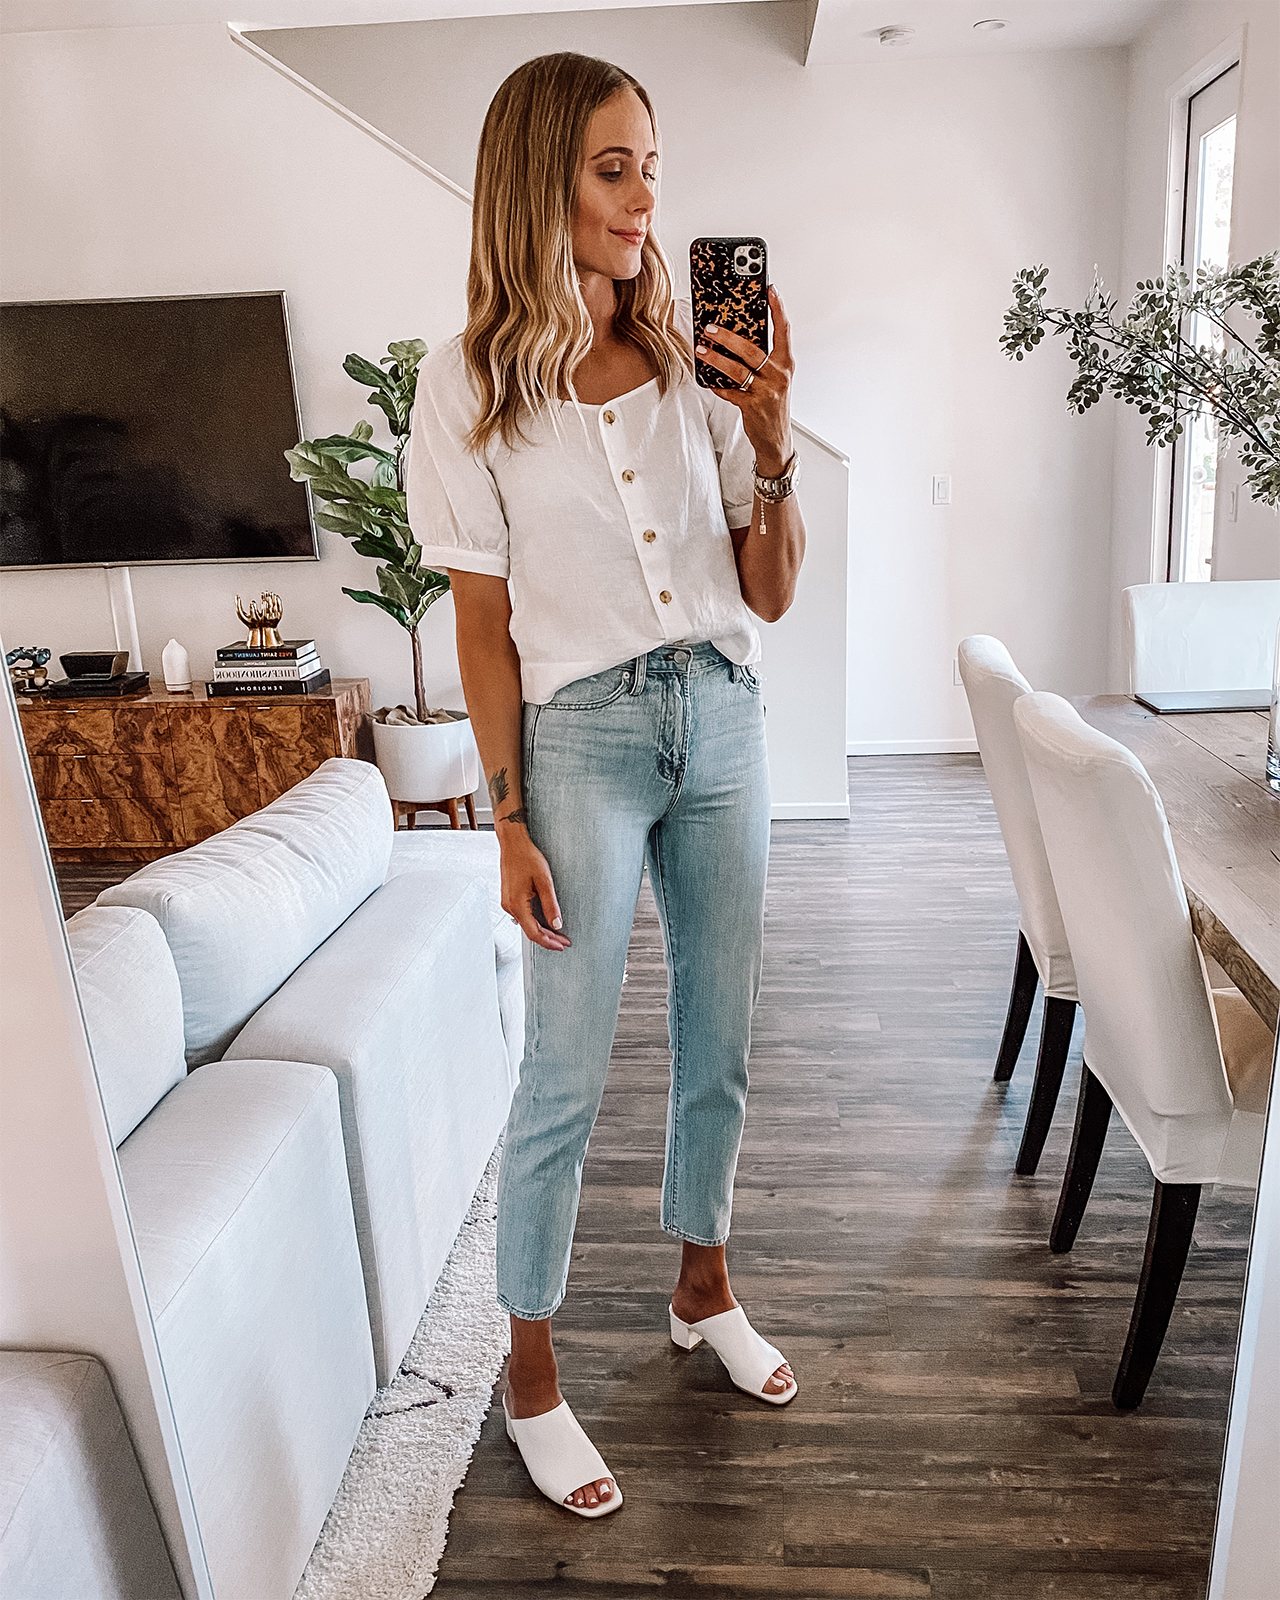 Fashion Jackson Wearing Everlane Linen White Puff Sleeve Top Light Wash Jeans White Heeled Mules